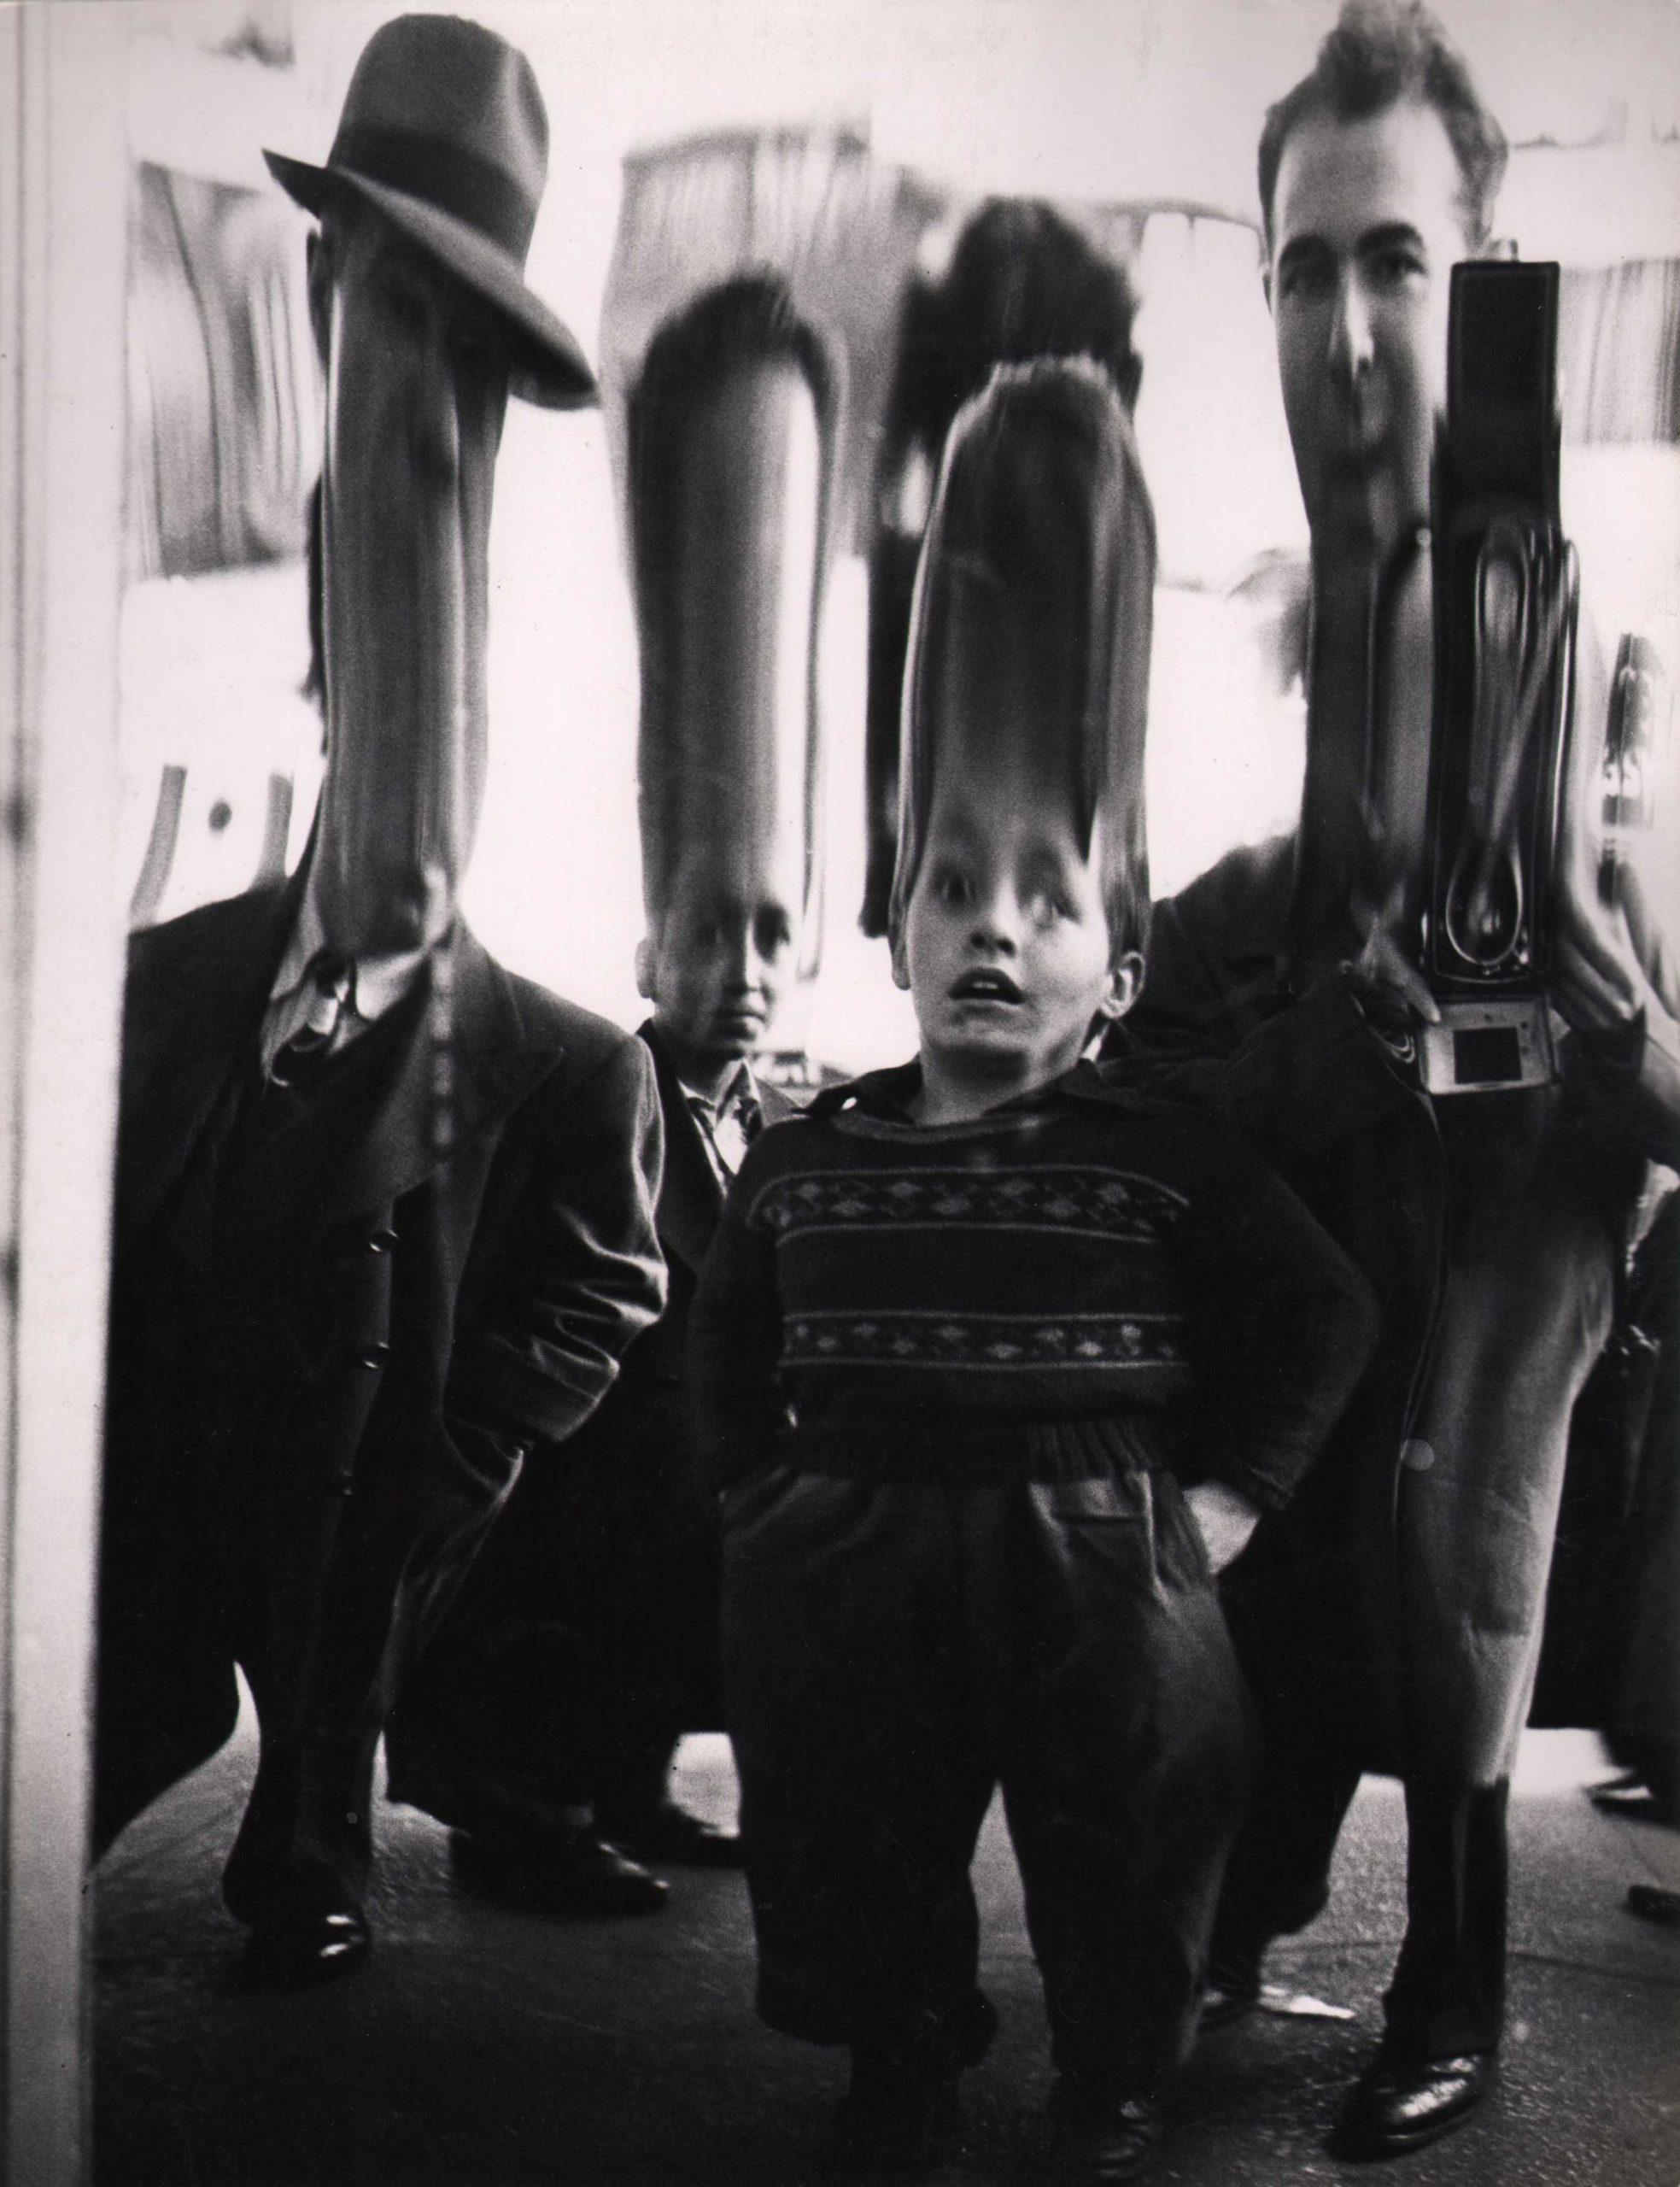 Benn Mitchell, Mirrors of Life, Self-Portrait, 42nd Street, 1950